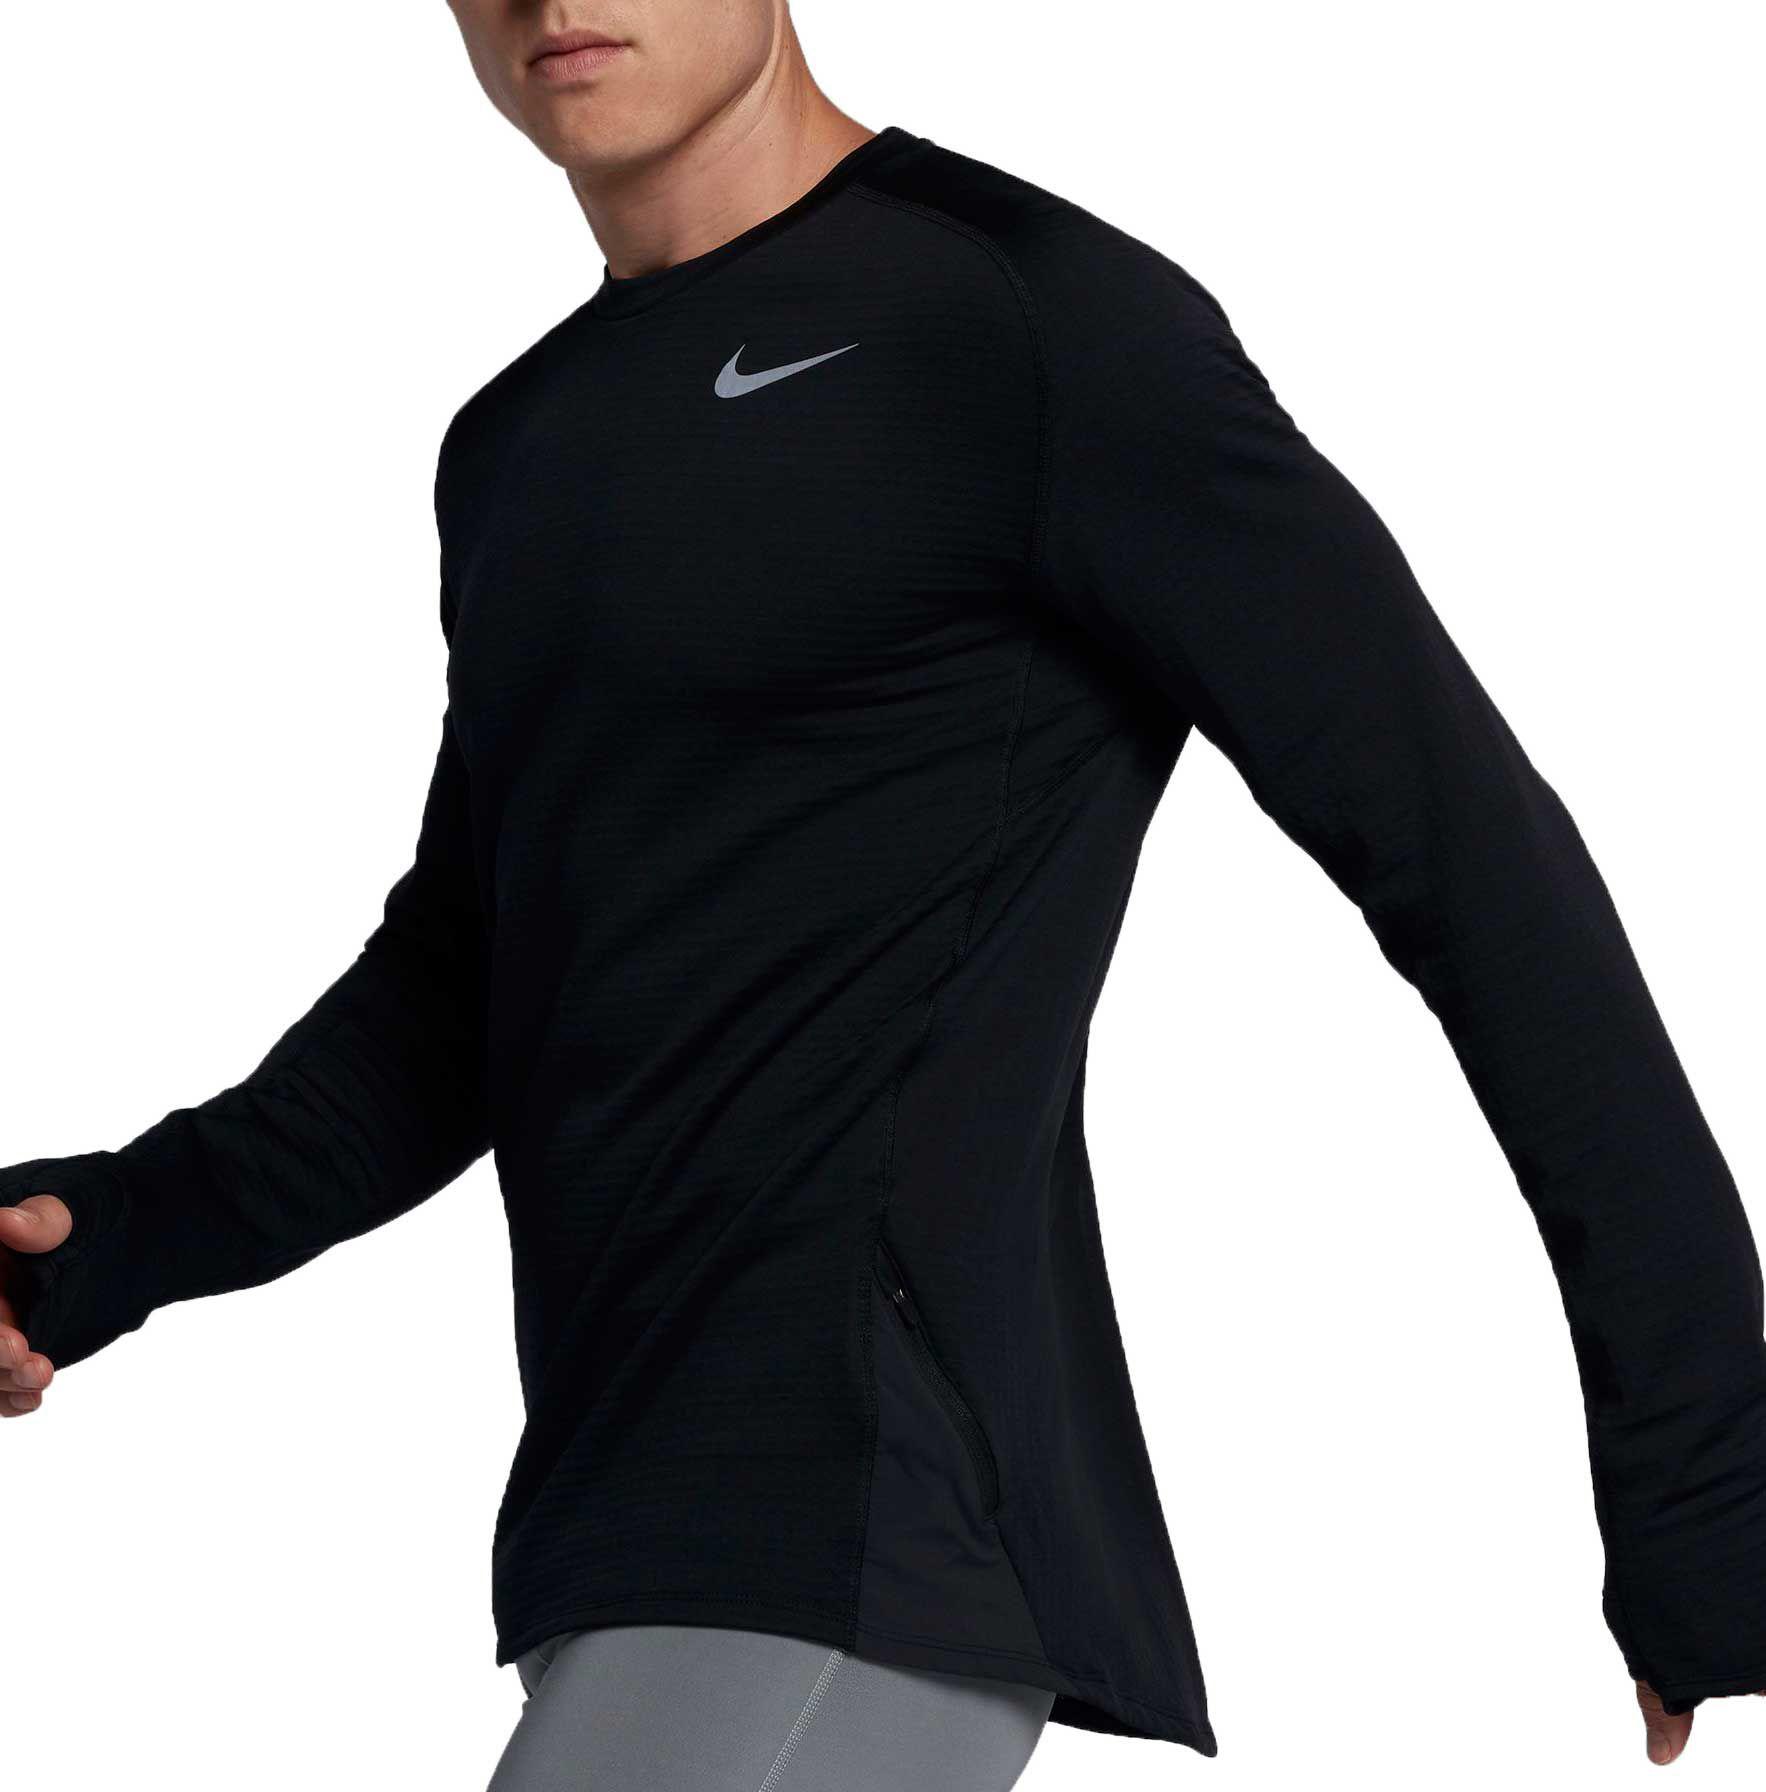 baec5d22 Nike Men's Therma Sphere Element Long Sleeve Crew Running Shirt ...